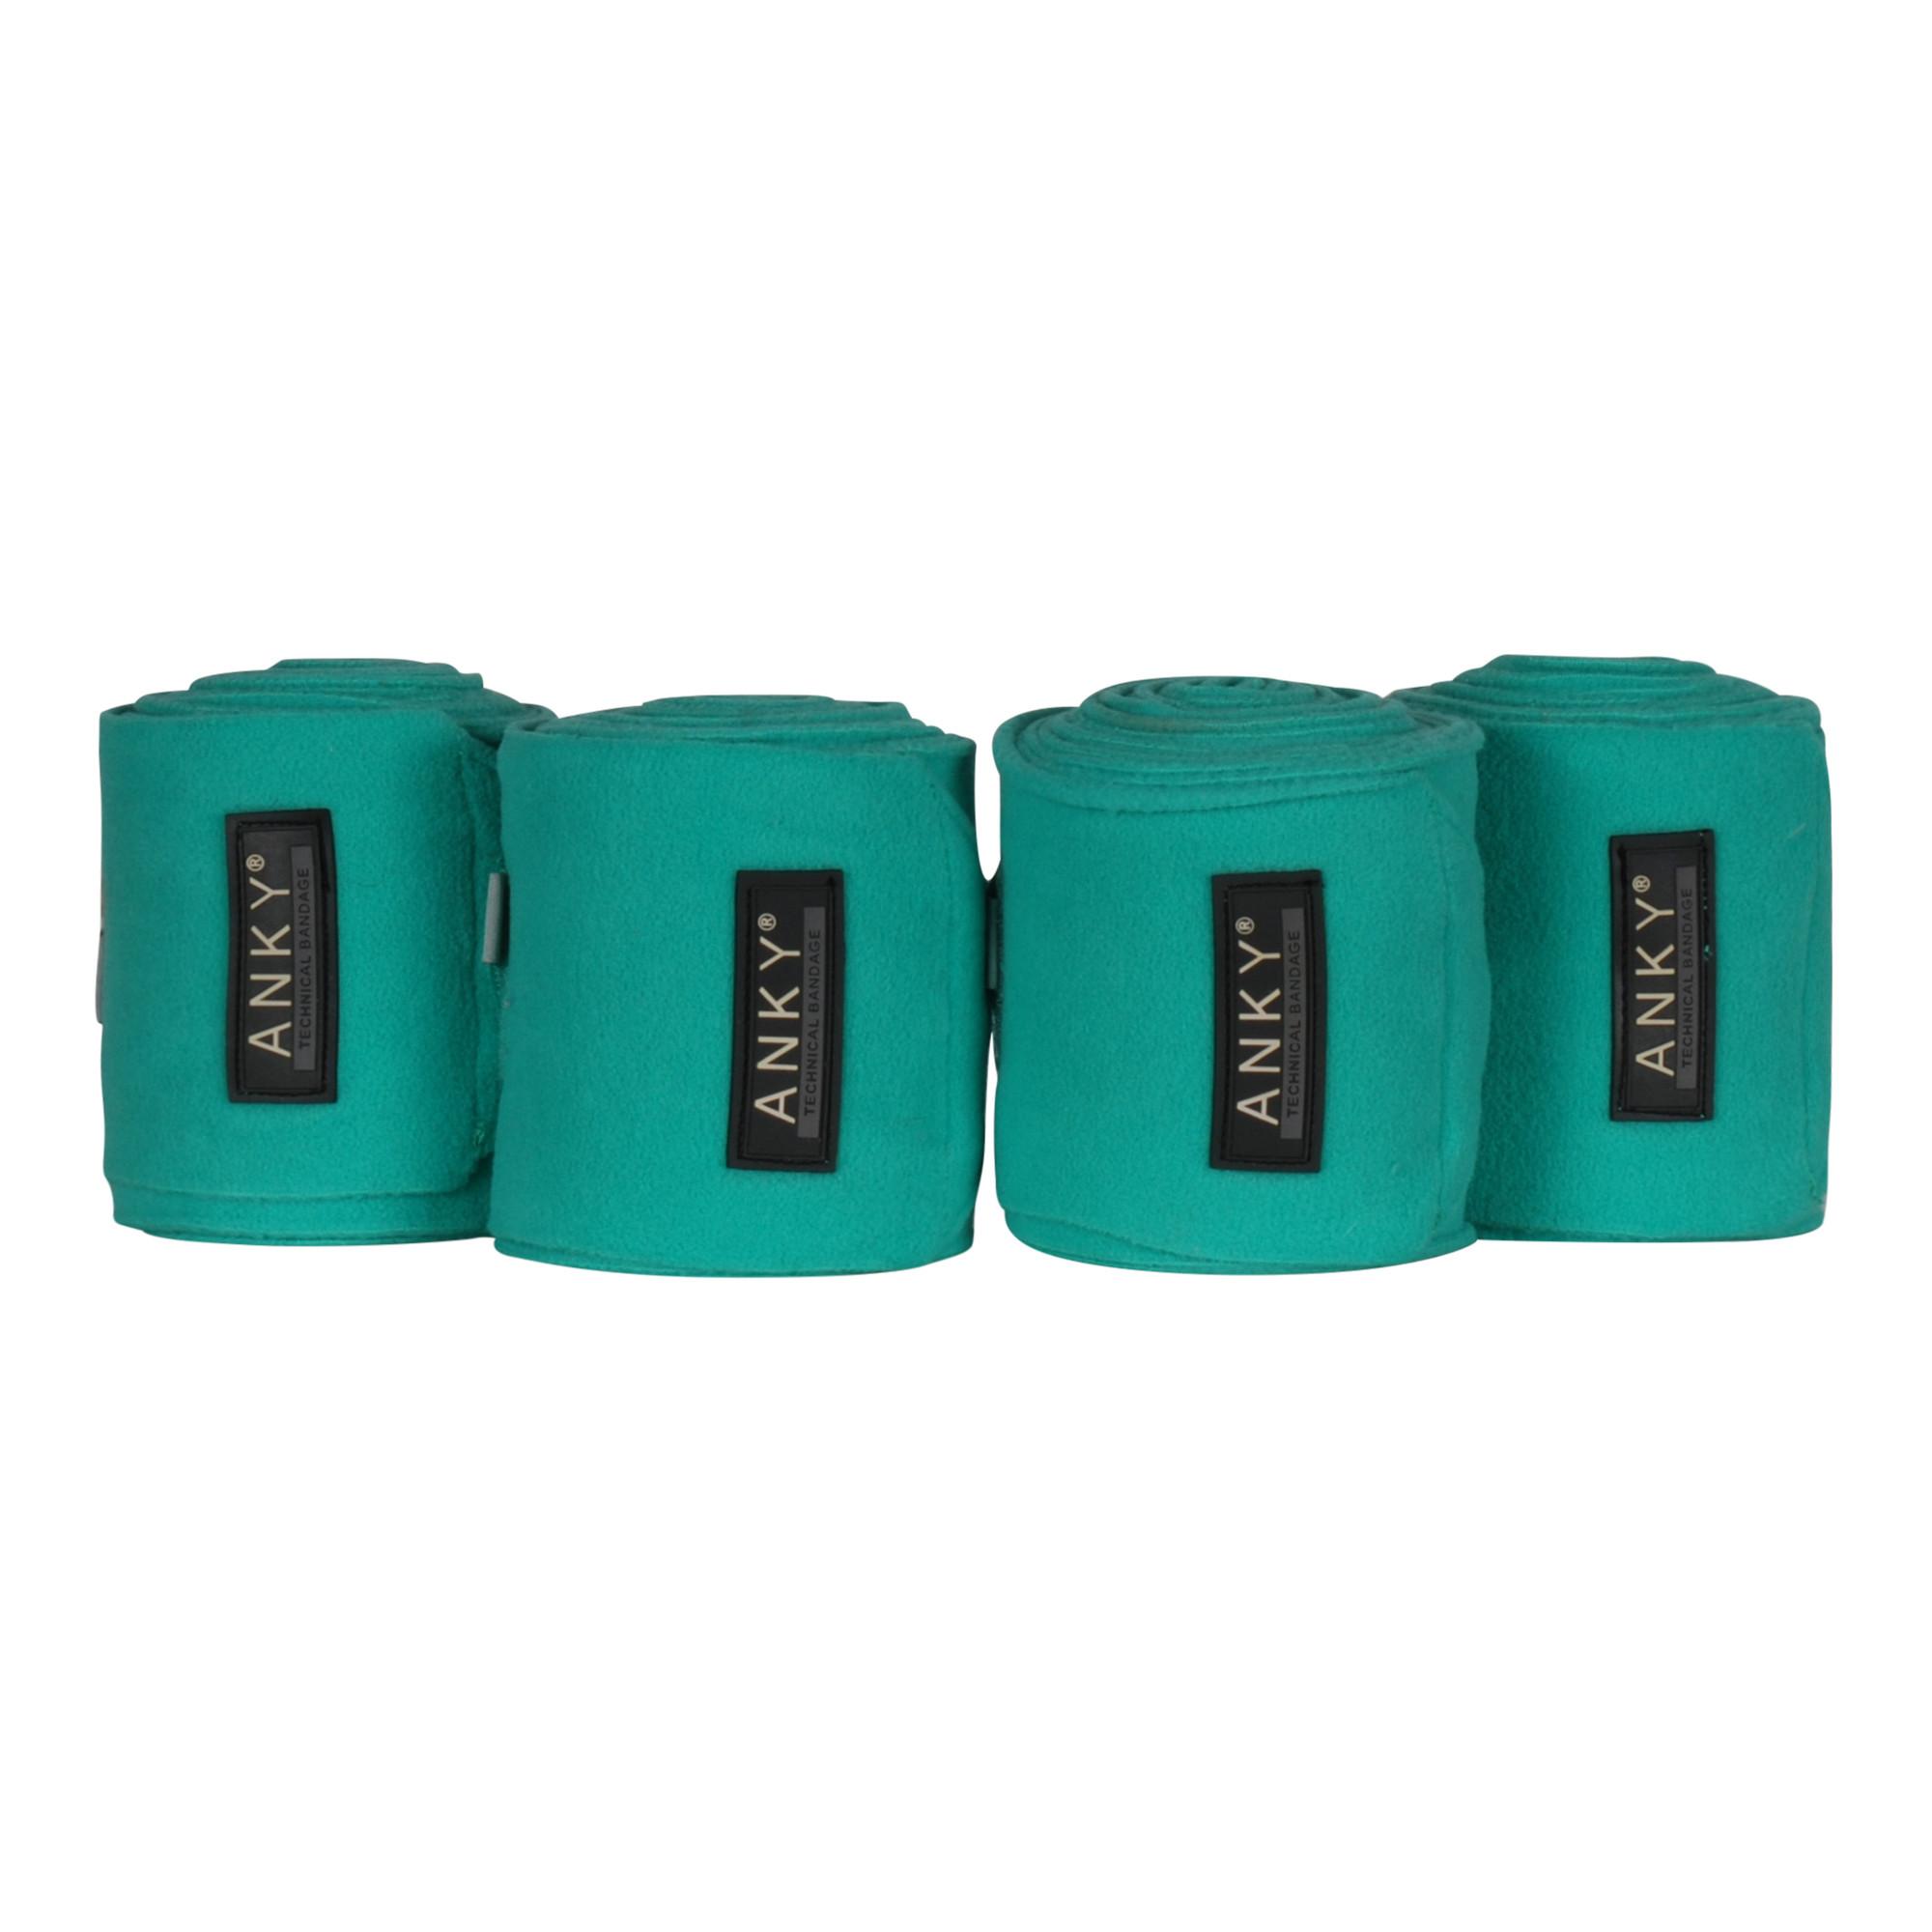 Anky ATB201001 bandages groen maat:full